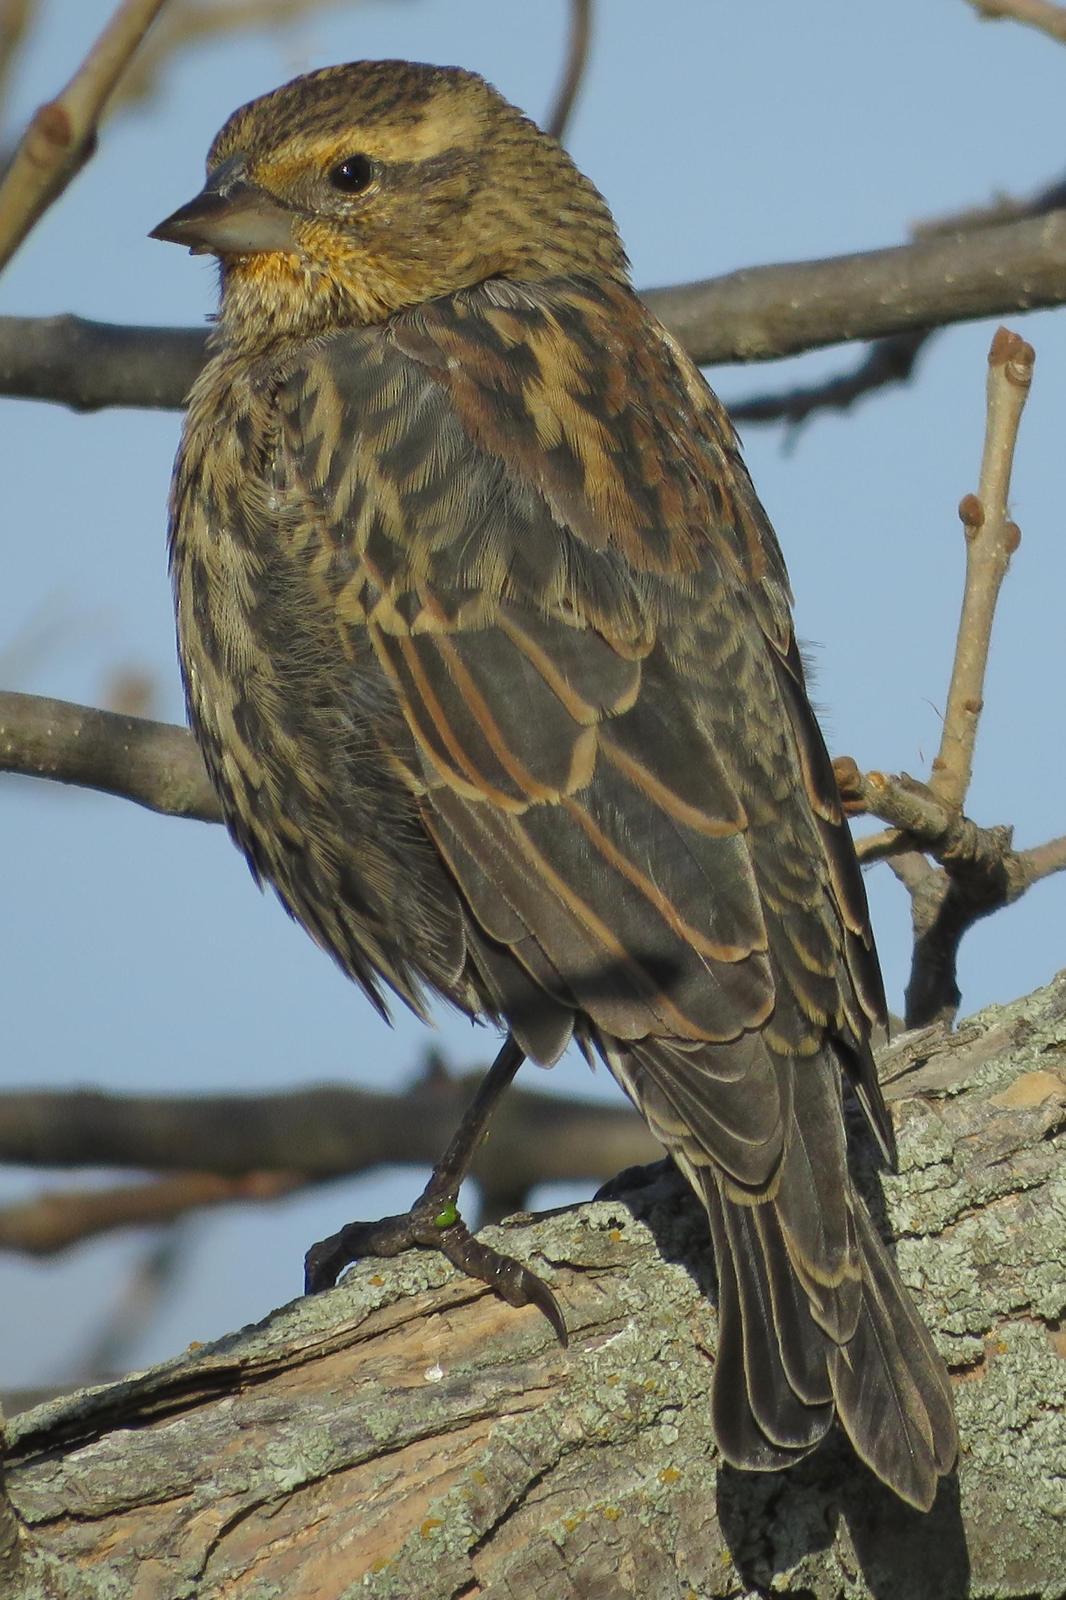 Red-winged Blackbird Photo by Bob Neugebauer